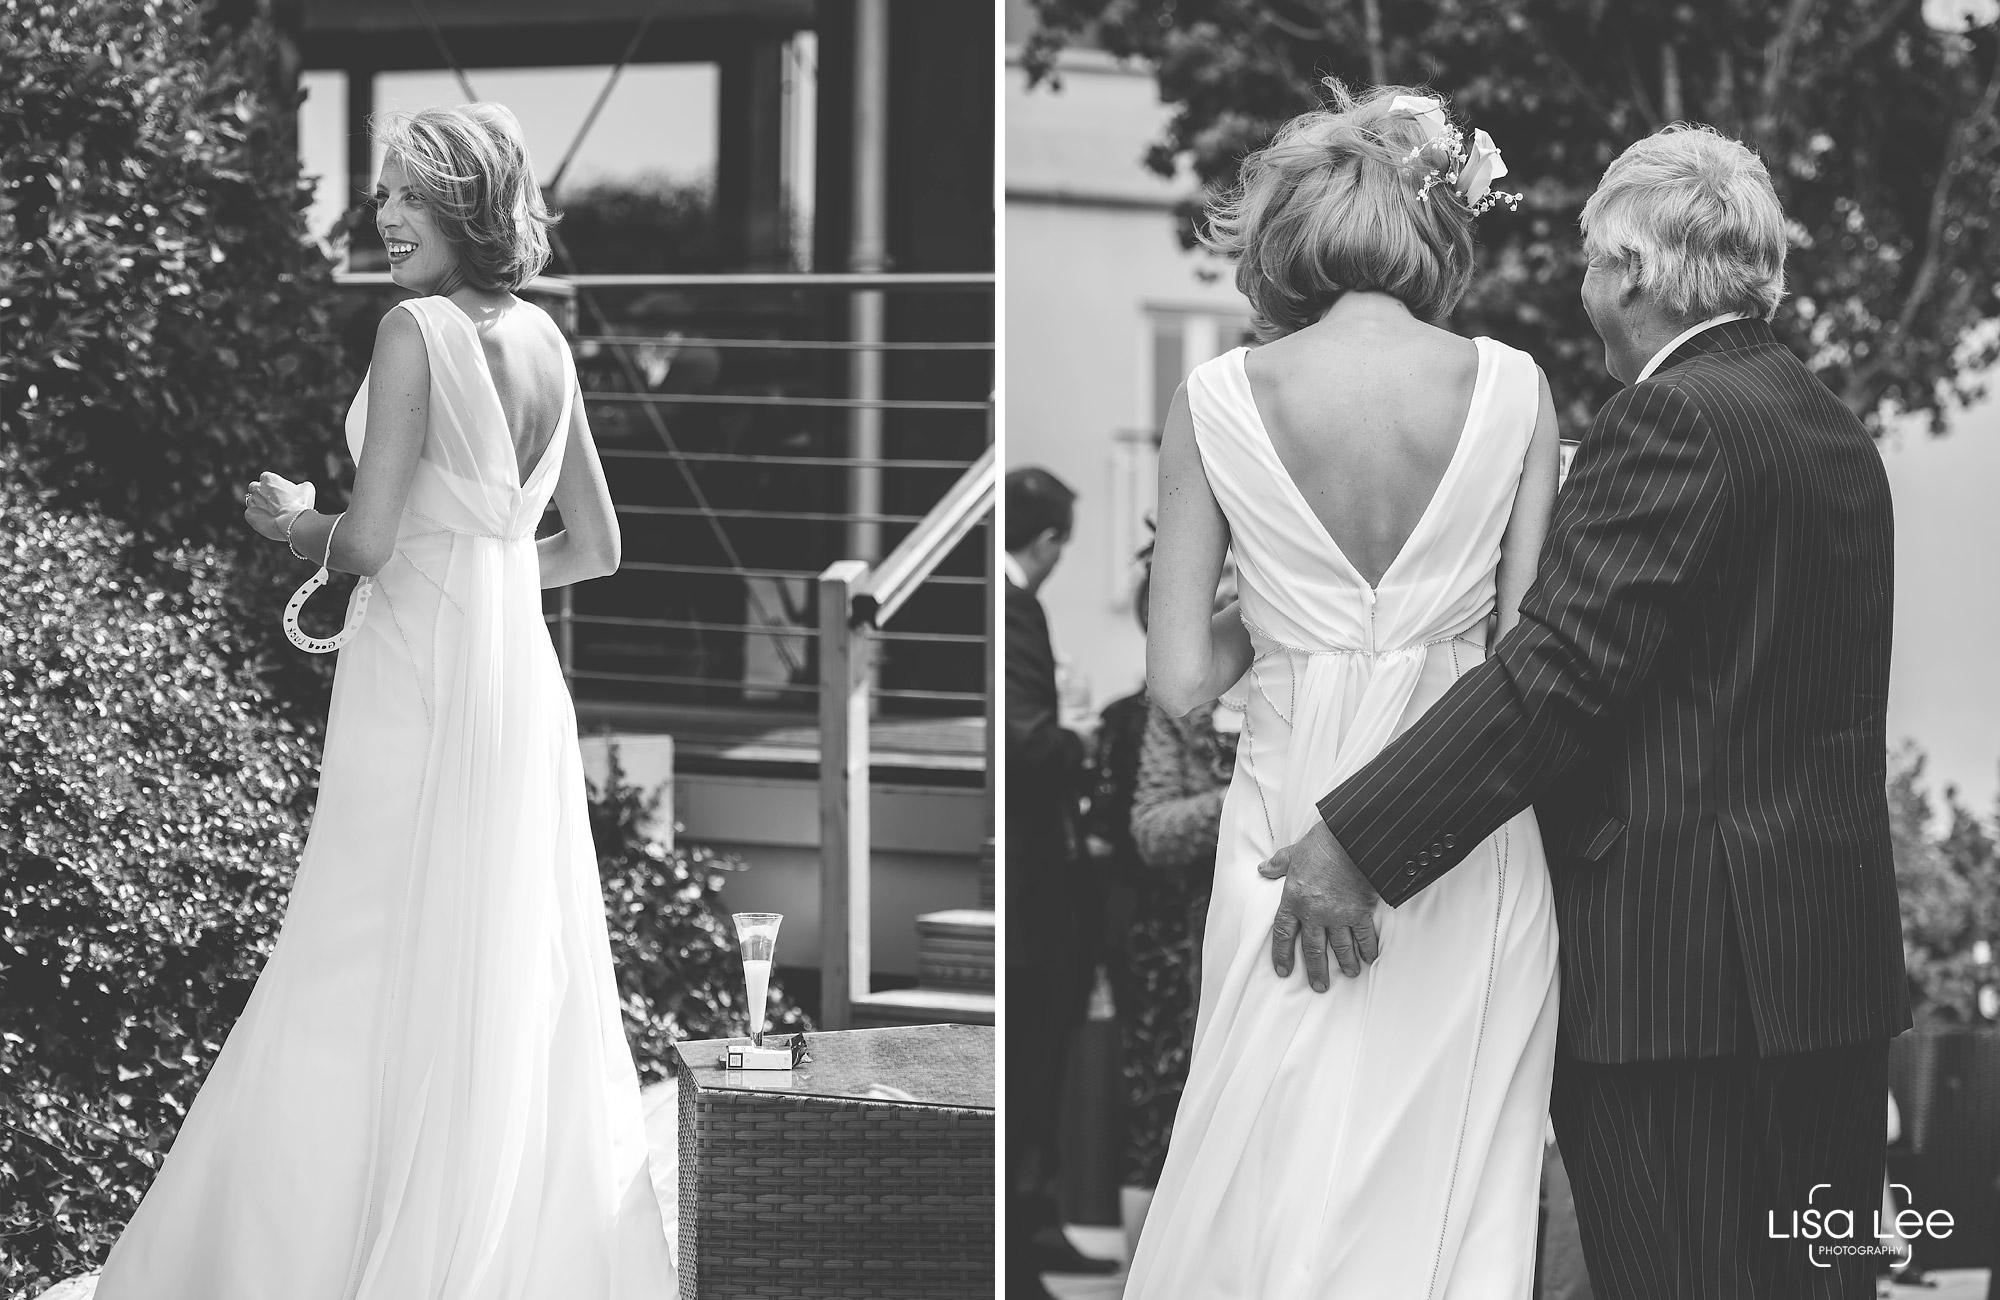 lisa-lee-wedding-photography-christchurch-dorset-bride4.jpg